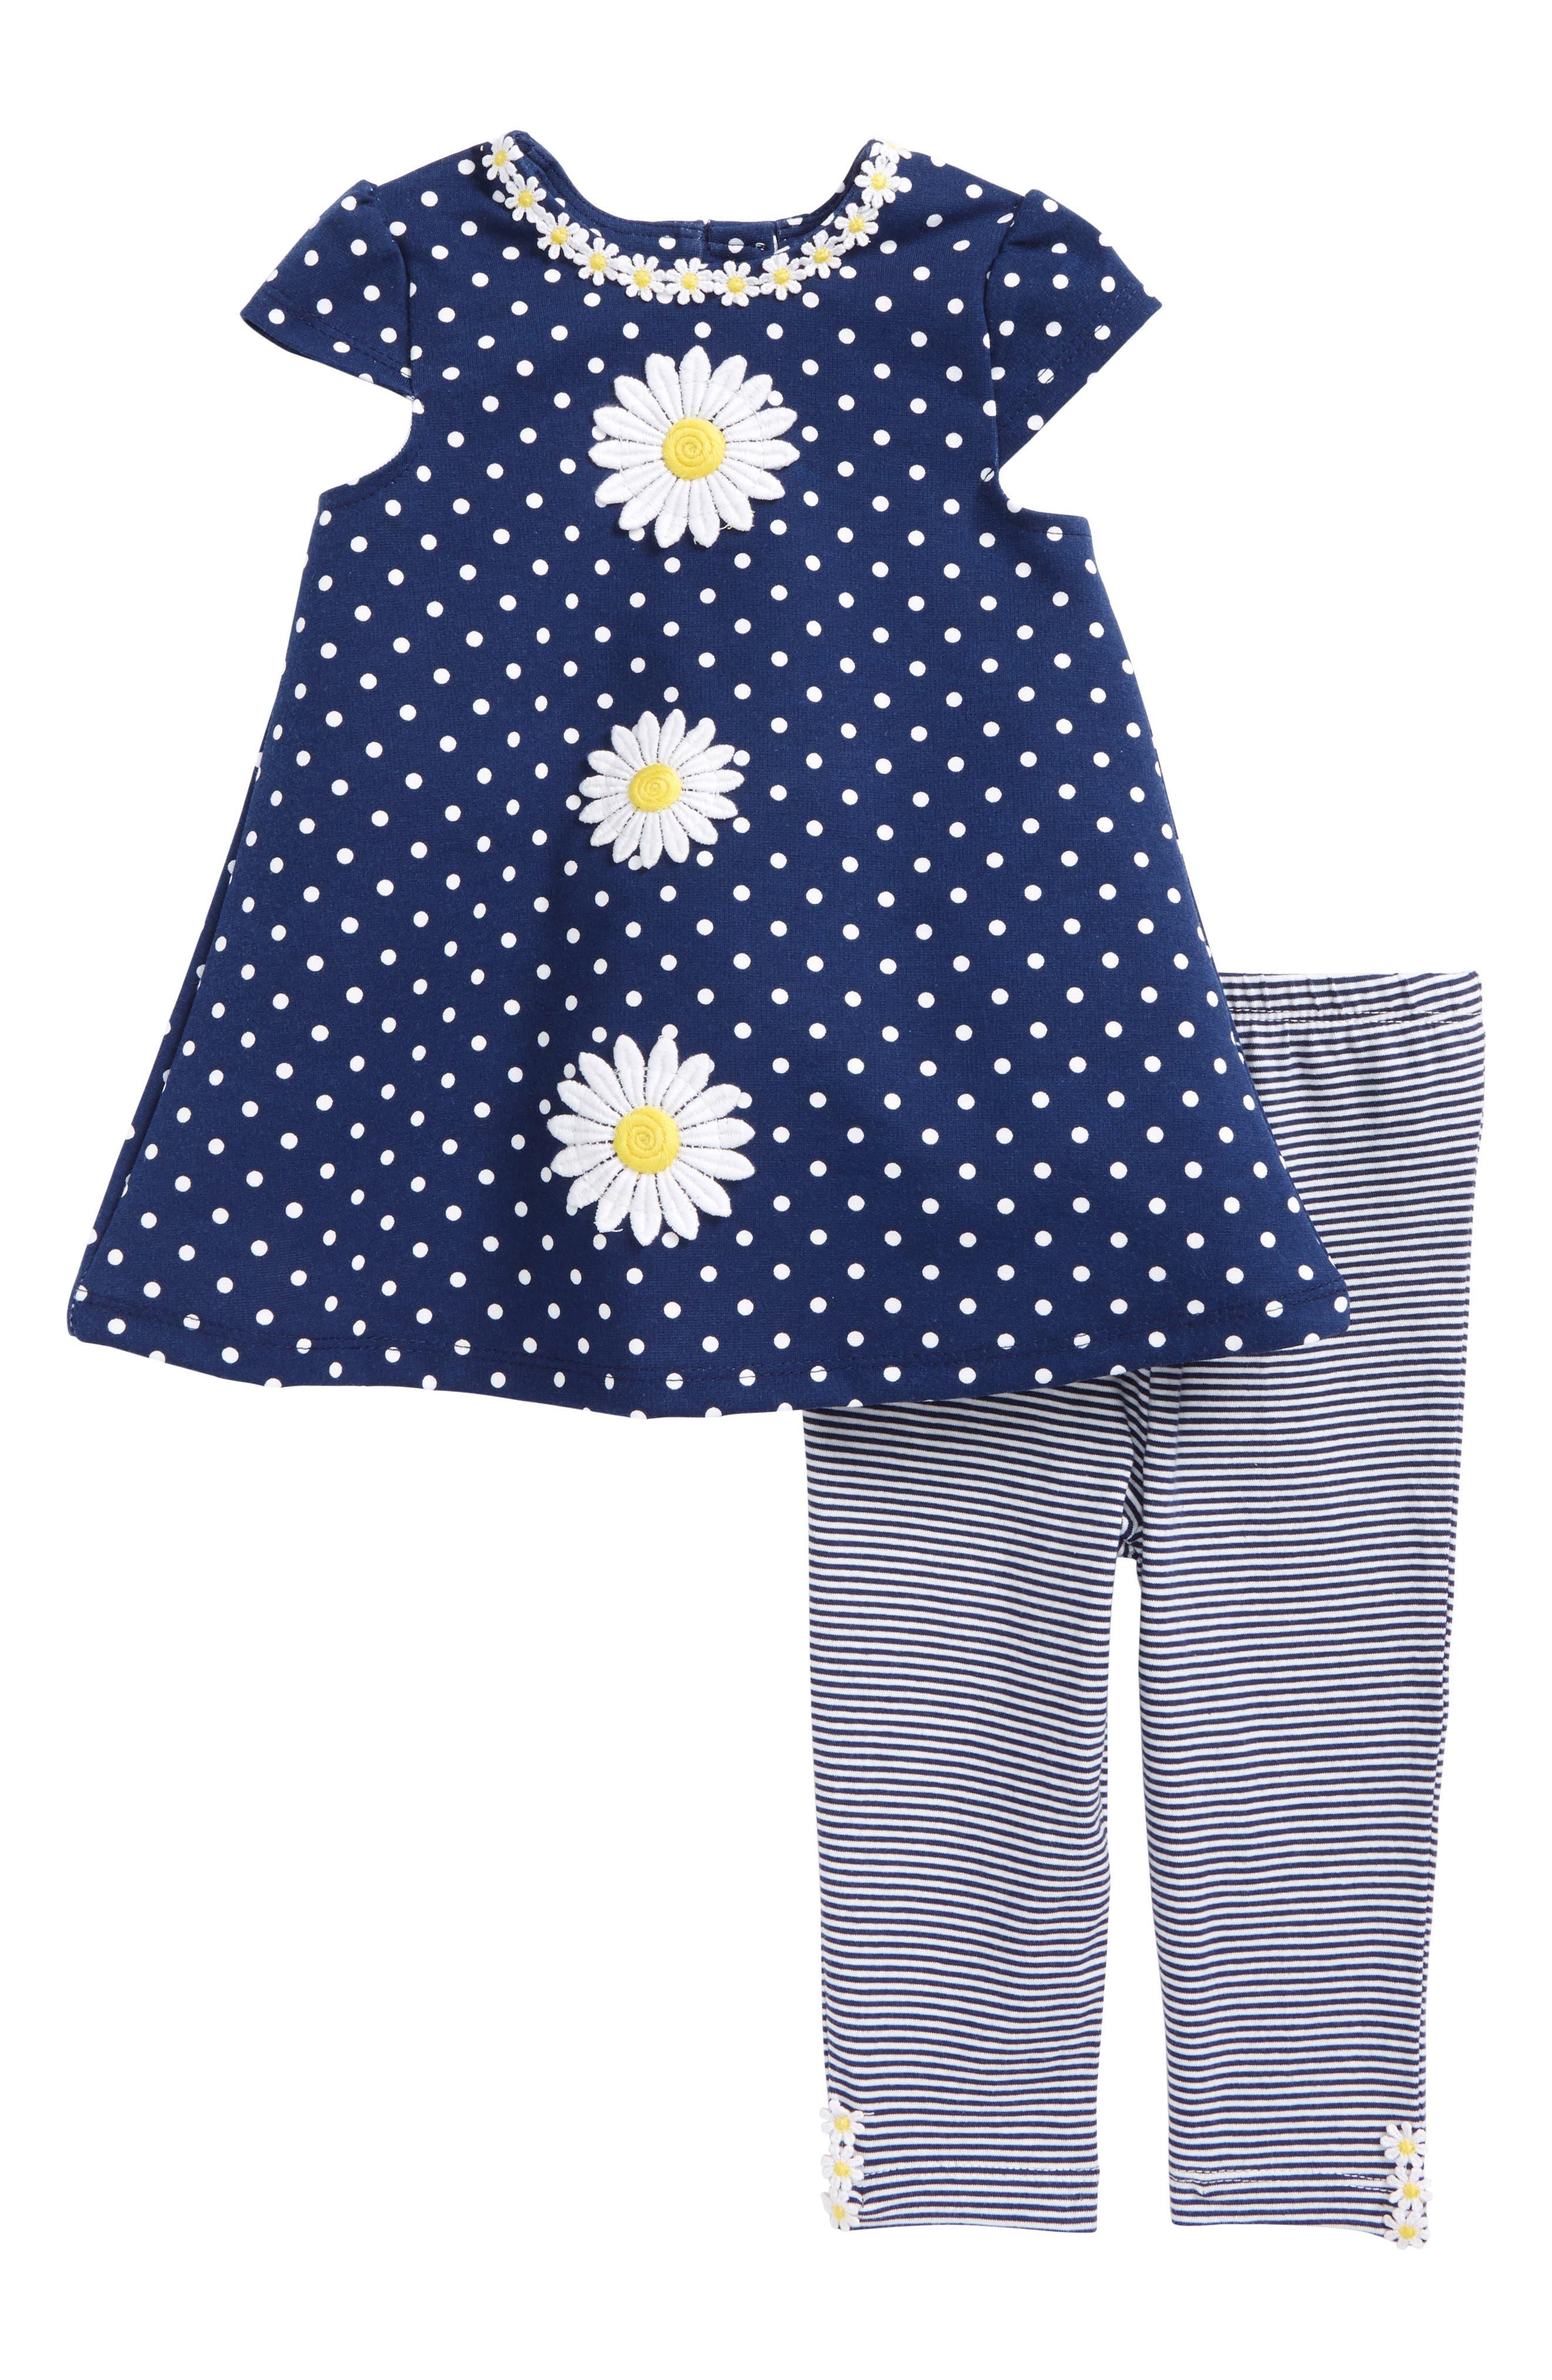 Daisy Polka Dot Dress & Stripe Leggings Set,                         Main,                         color, Navy